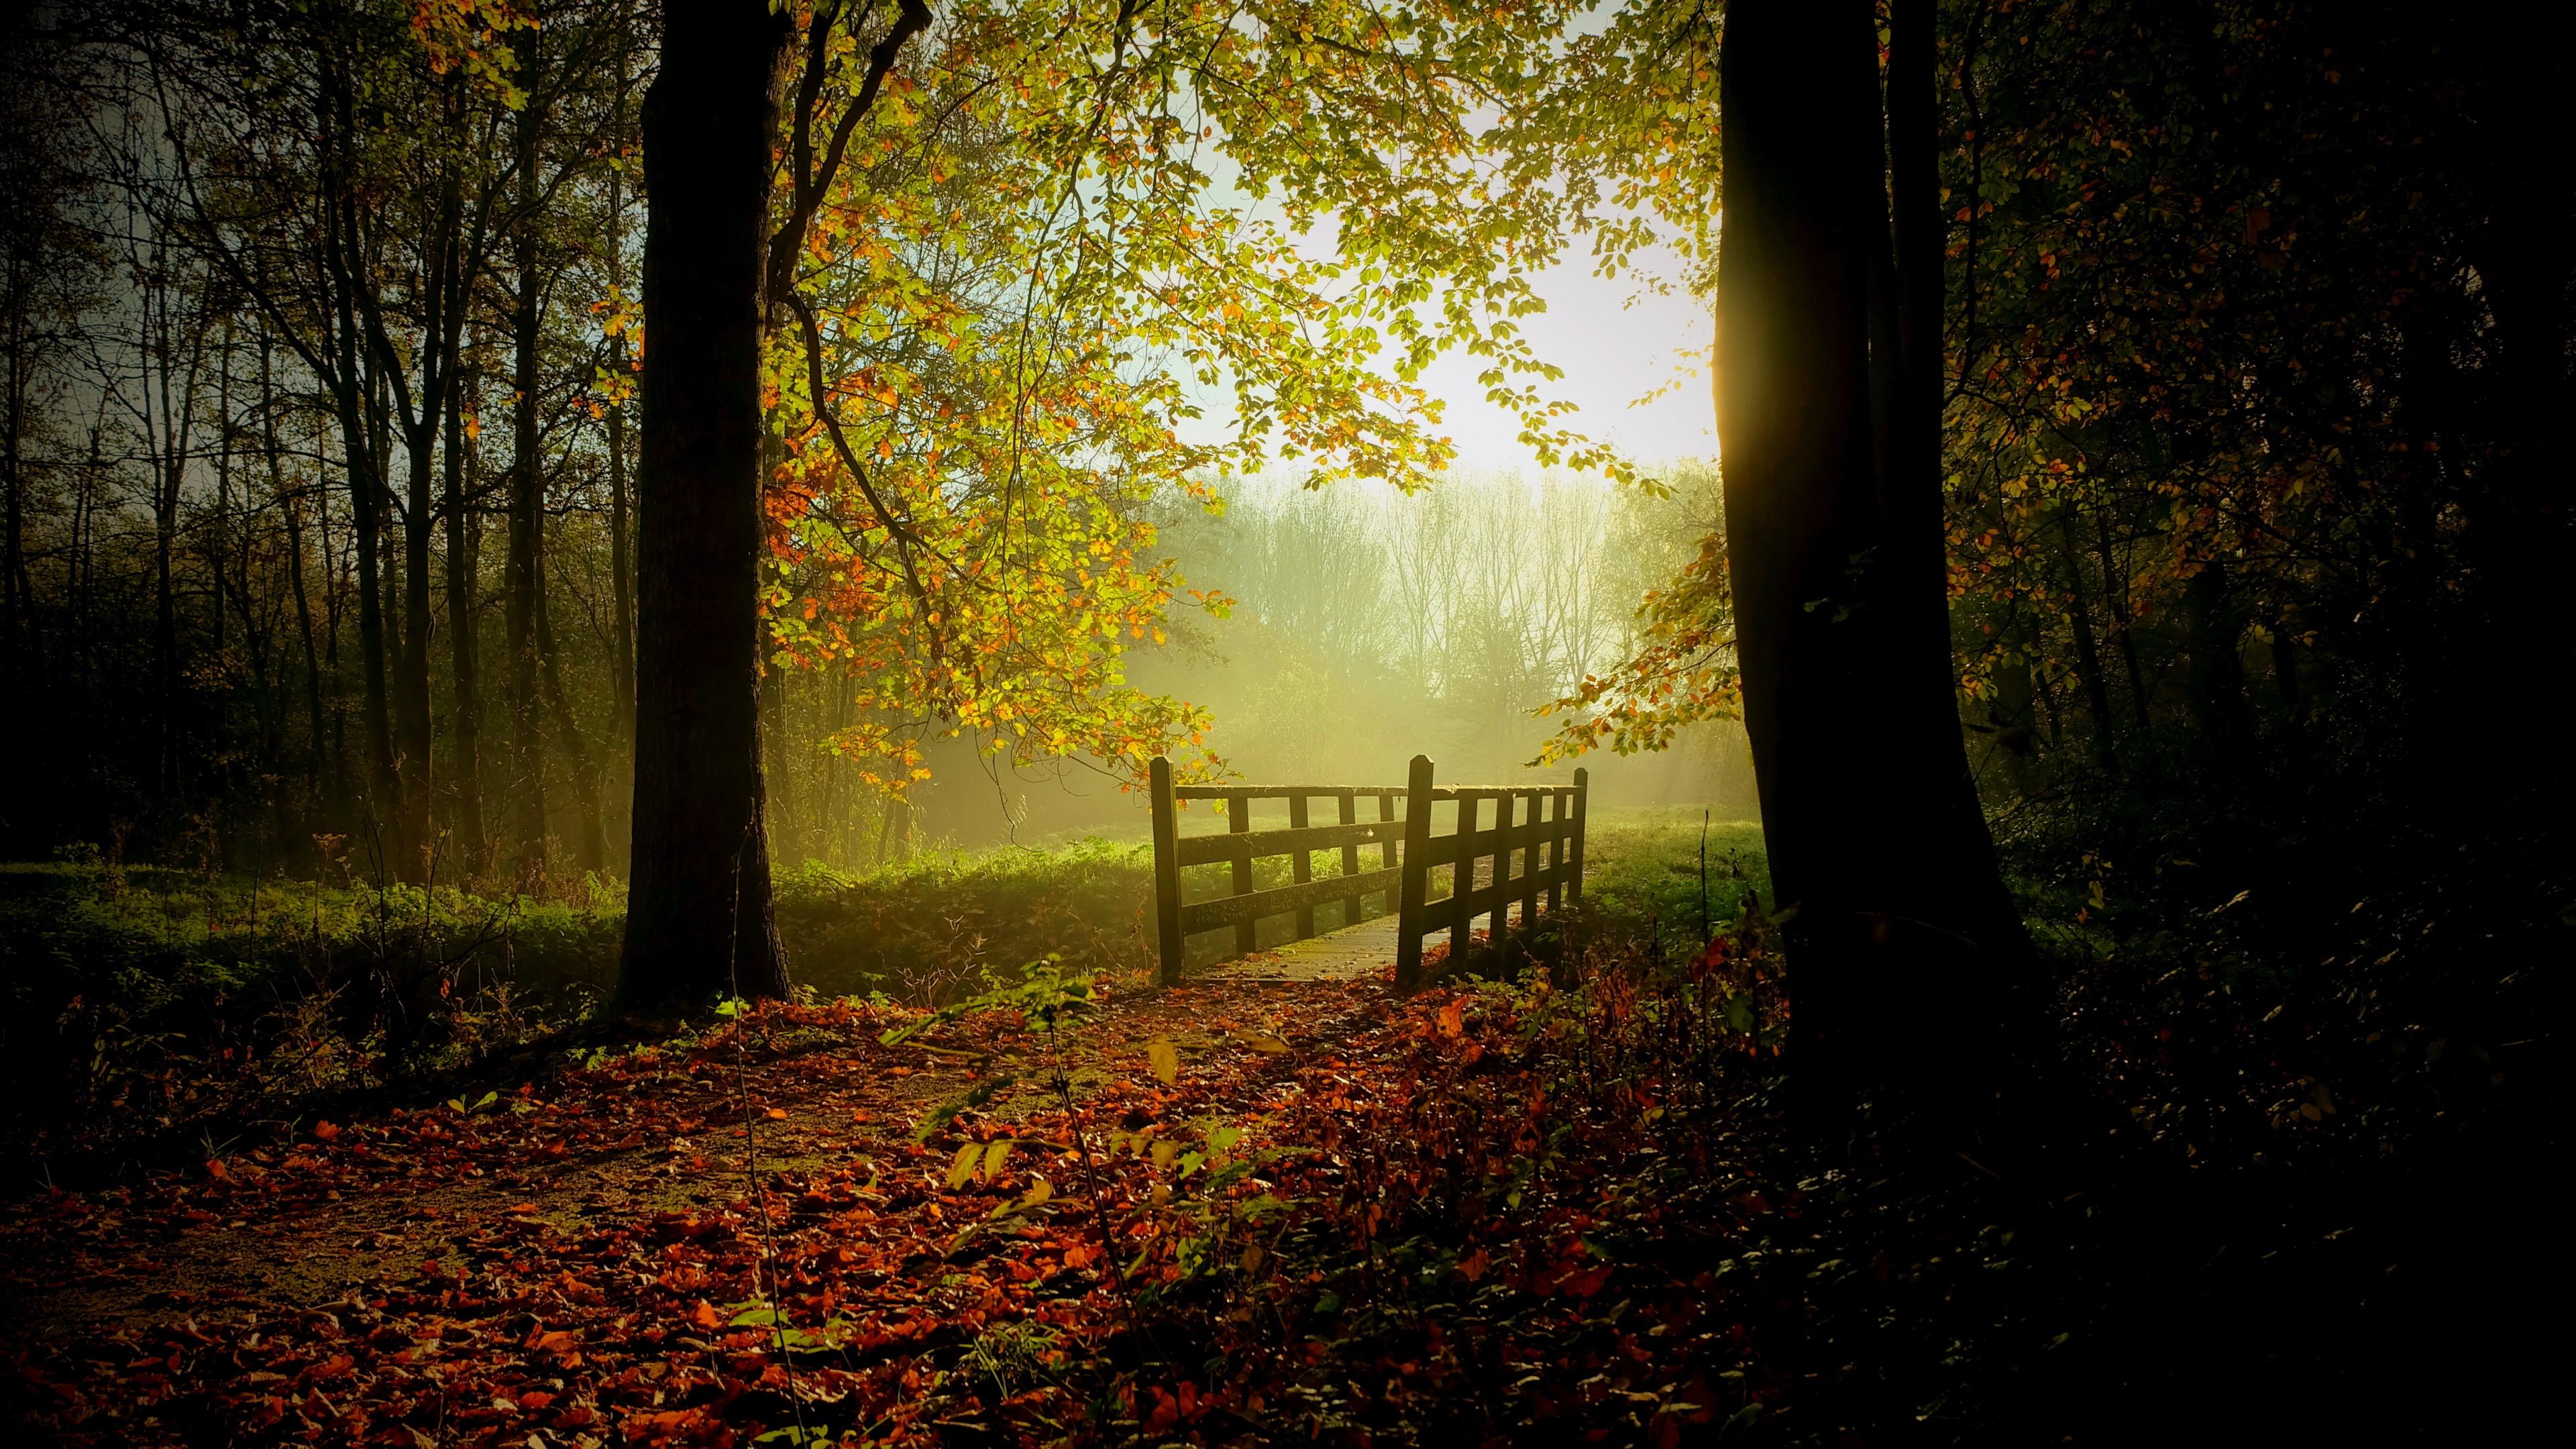 Вечерний осенний лес в отблесках заходящего солнца